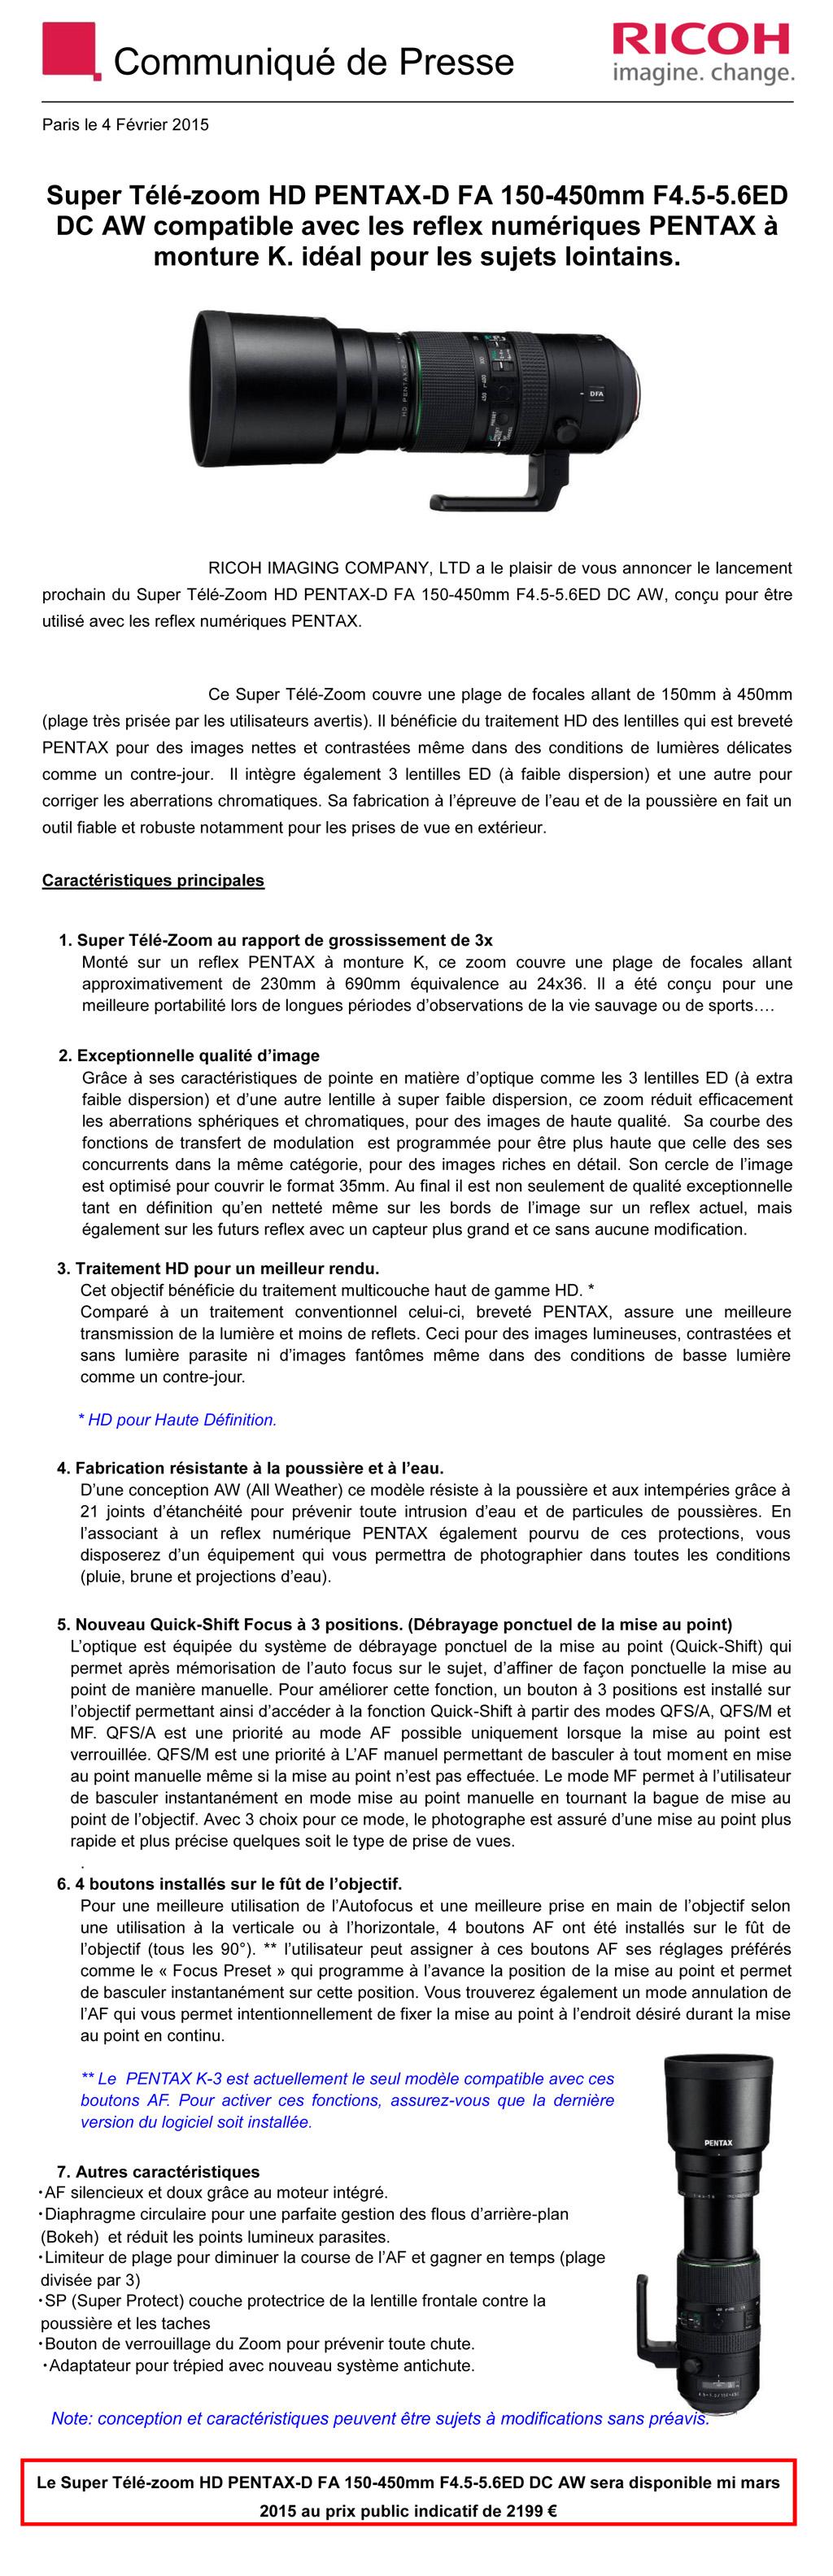 PENTAX RICOH IMAGING - Communiqué de Presse 04/02/2015 - D FA 150-450 F4.5-5.6ED DC A XsSTwF